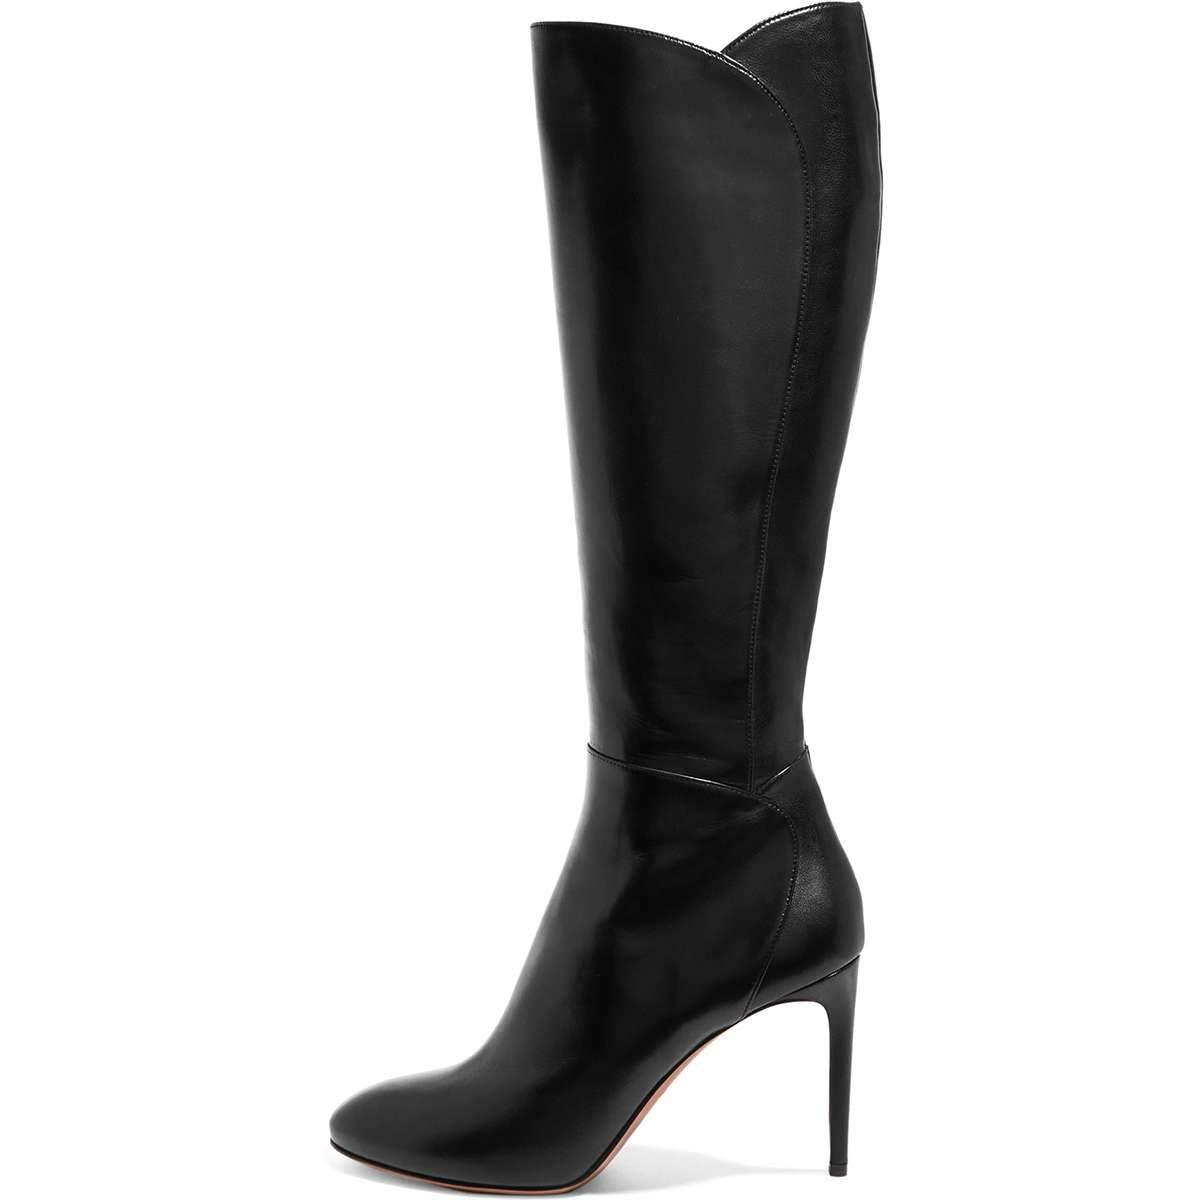 30c71e2f374 Amazon.com | FSJ Women Knee High Long Boots Round Toe Stiletto Heel ...